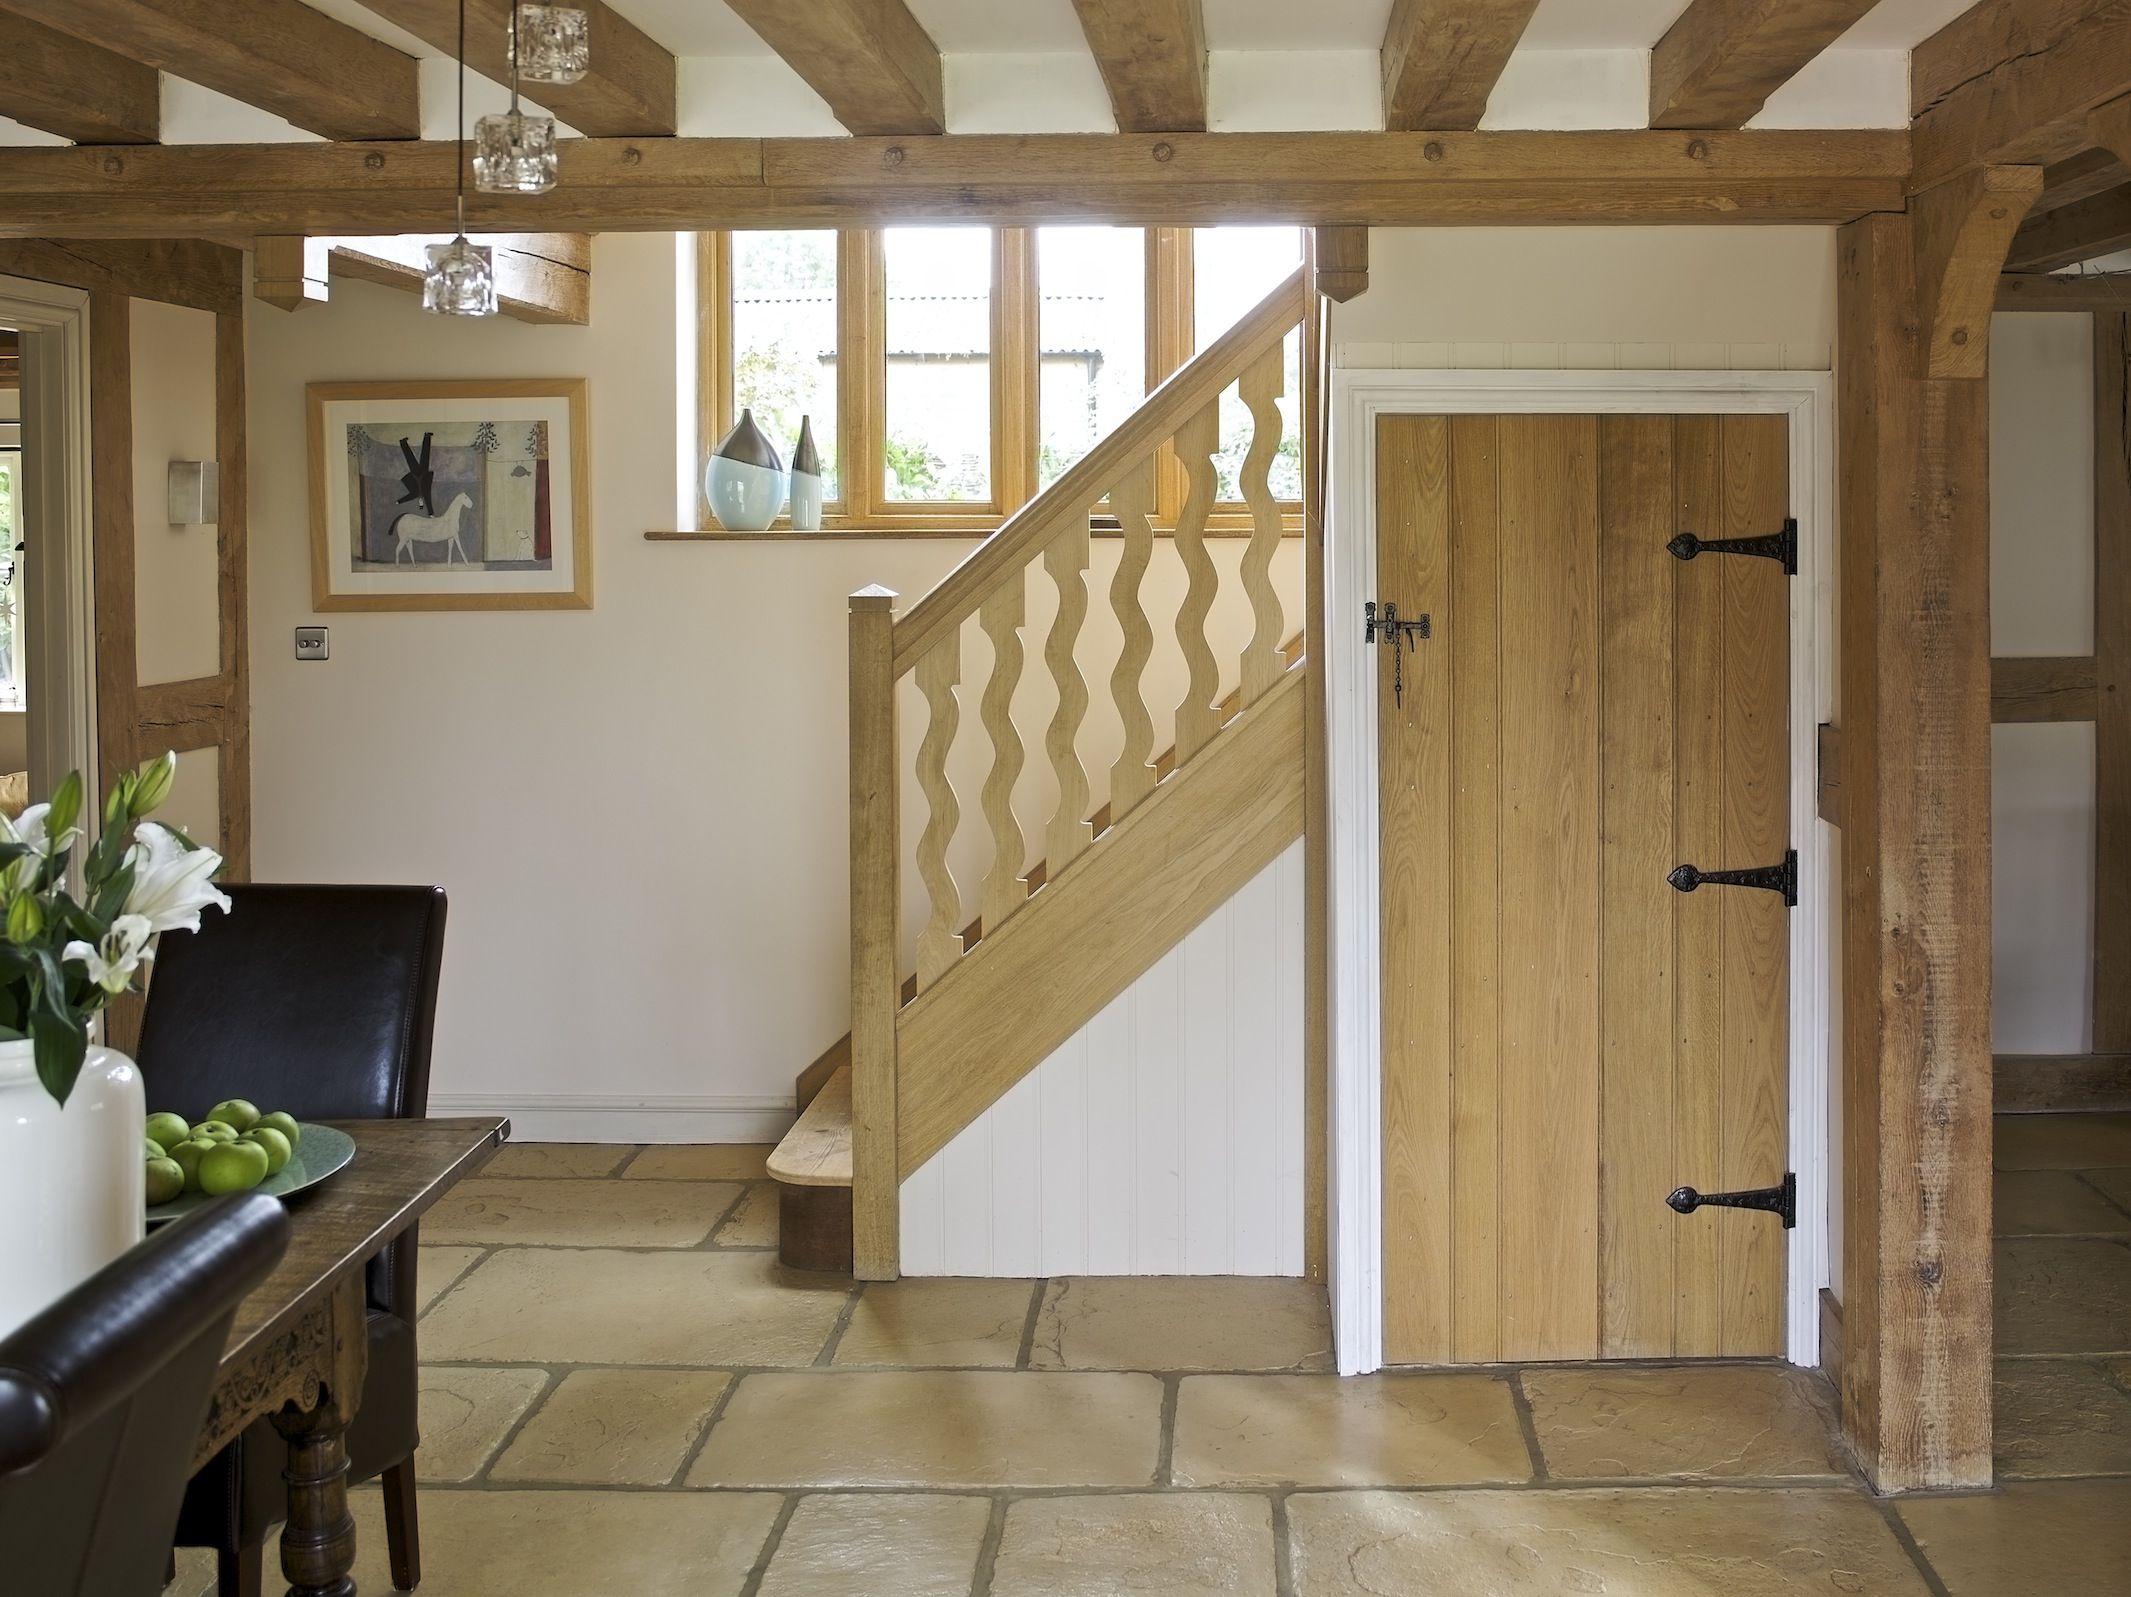 Border oak farmhouse hallway decor ideas pinterest border oak house and english cottages - Country cottage hallways ...